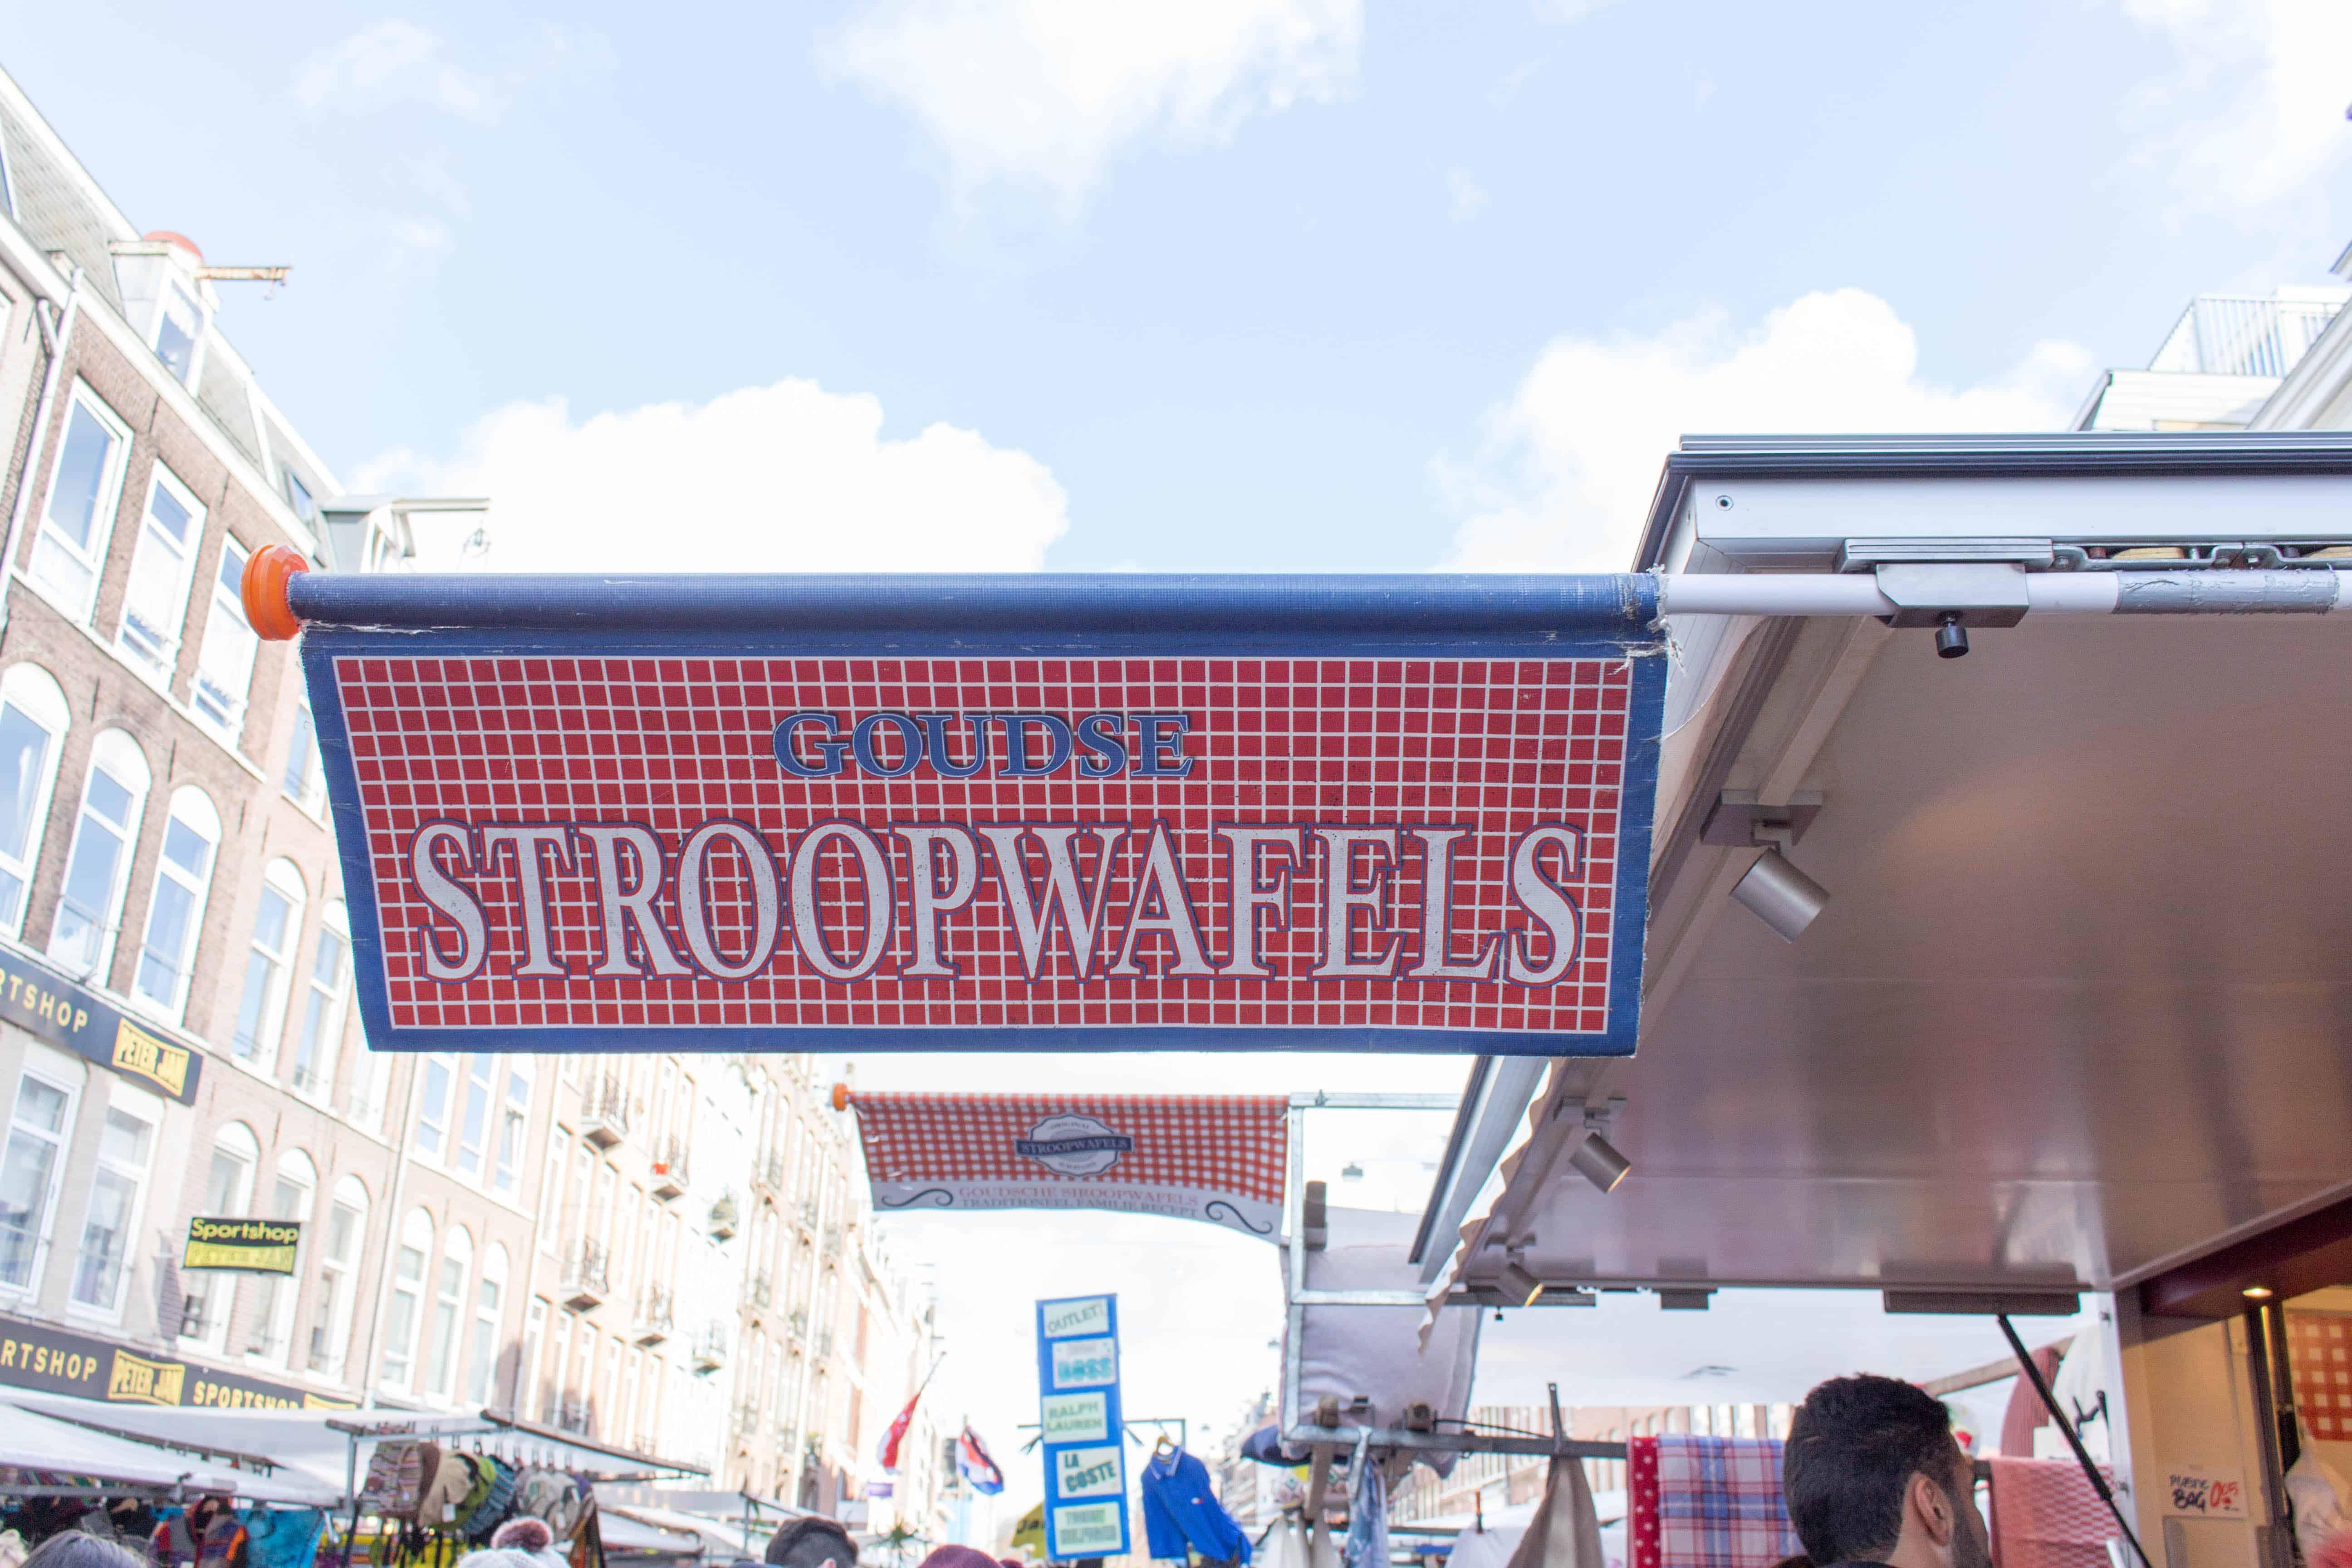 stroopwafels in amsterdam in albert cuyp market